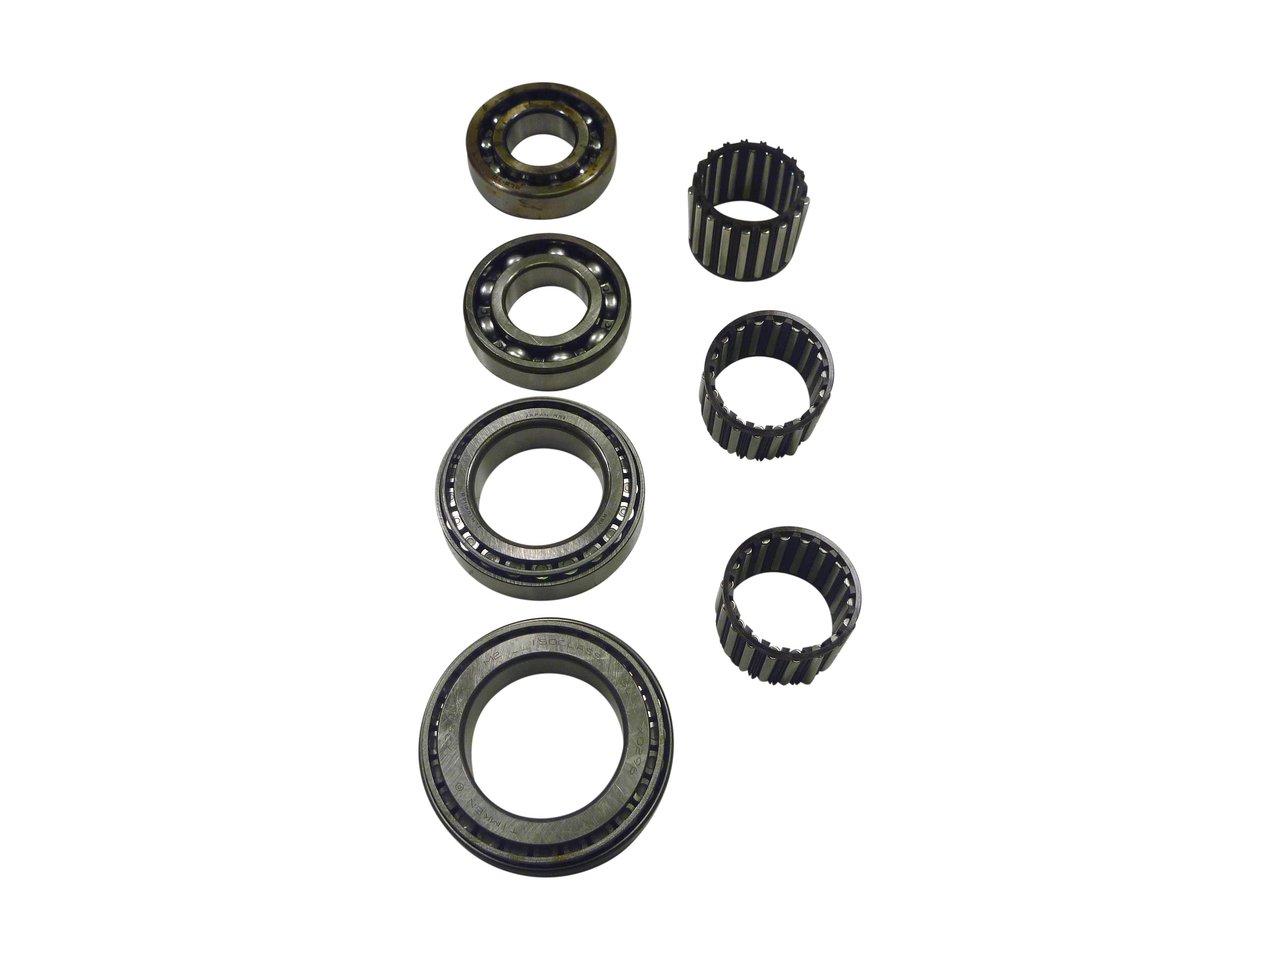 Transfer Case Repair Kit Suitable For Land Rover Range